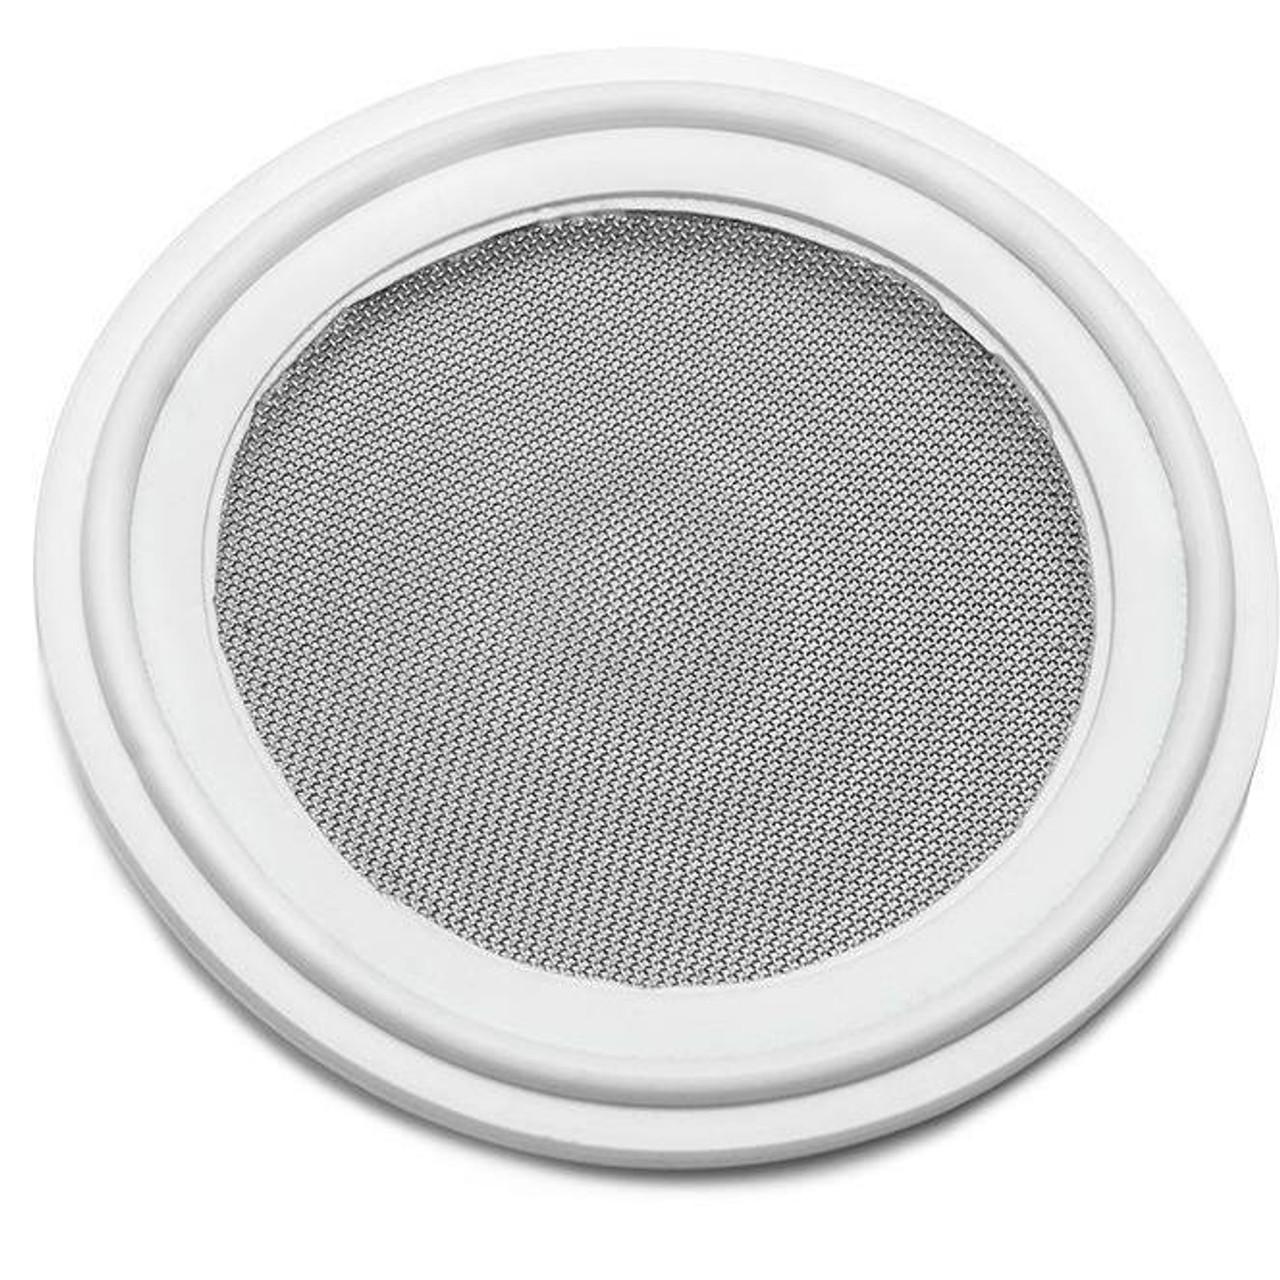 Silicone 50 Mesh (300 Micron)